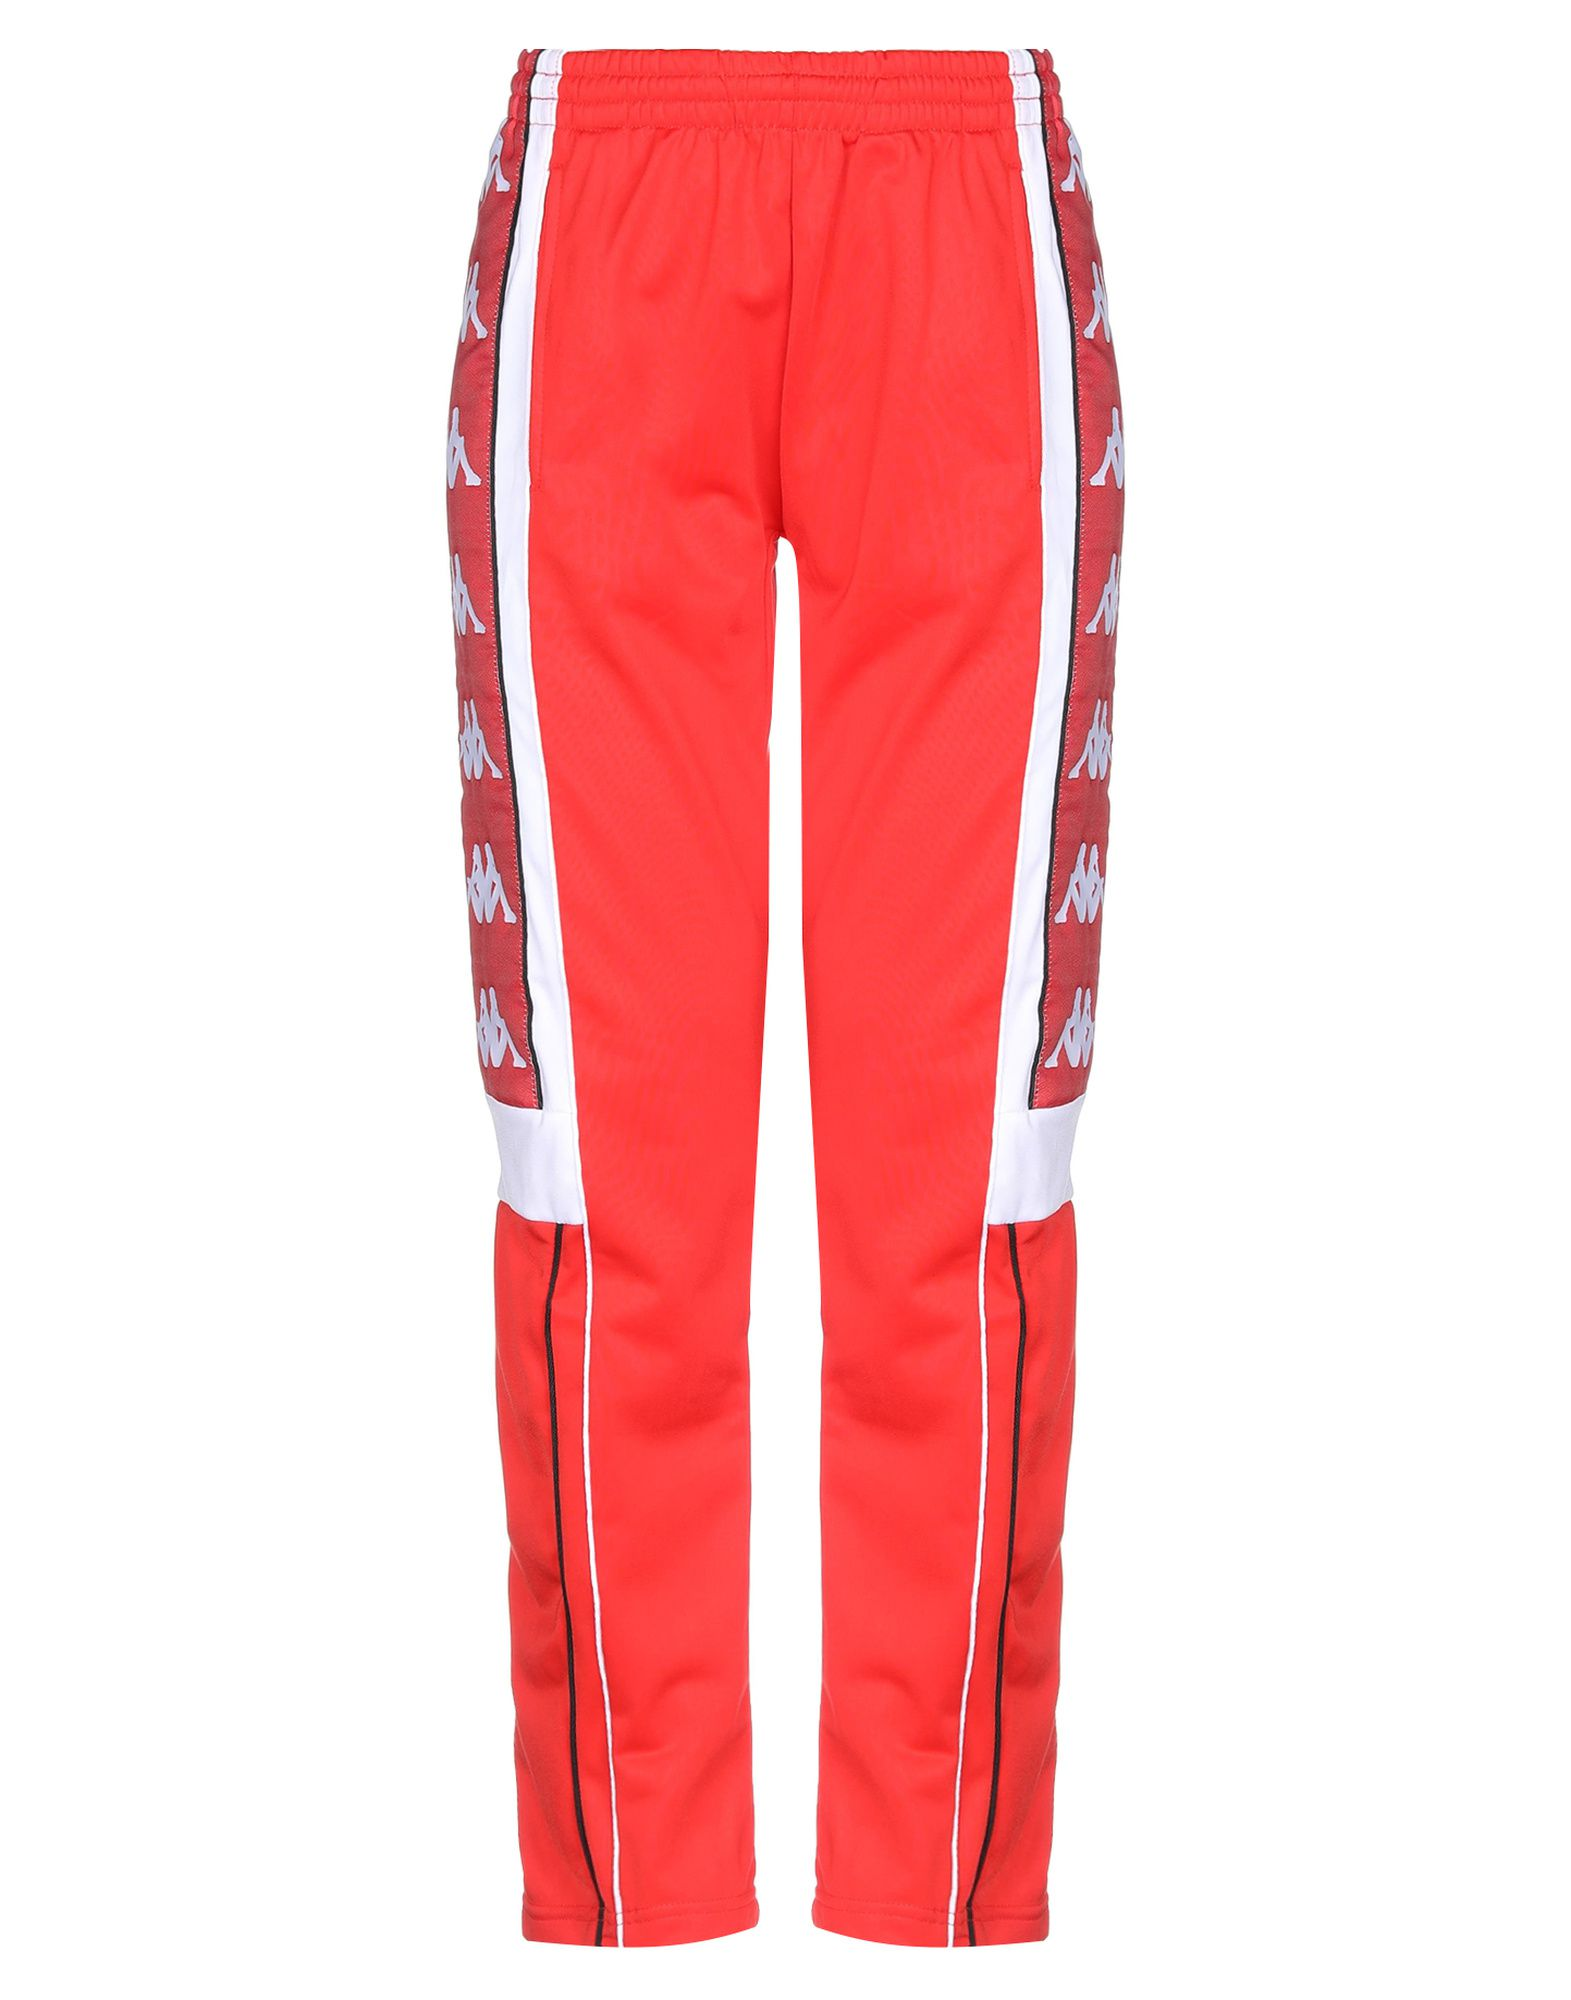 Pantalone Kappa donna - 13345258LJ 13345258LJ 13345258LJ 6bf